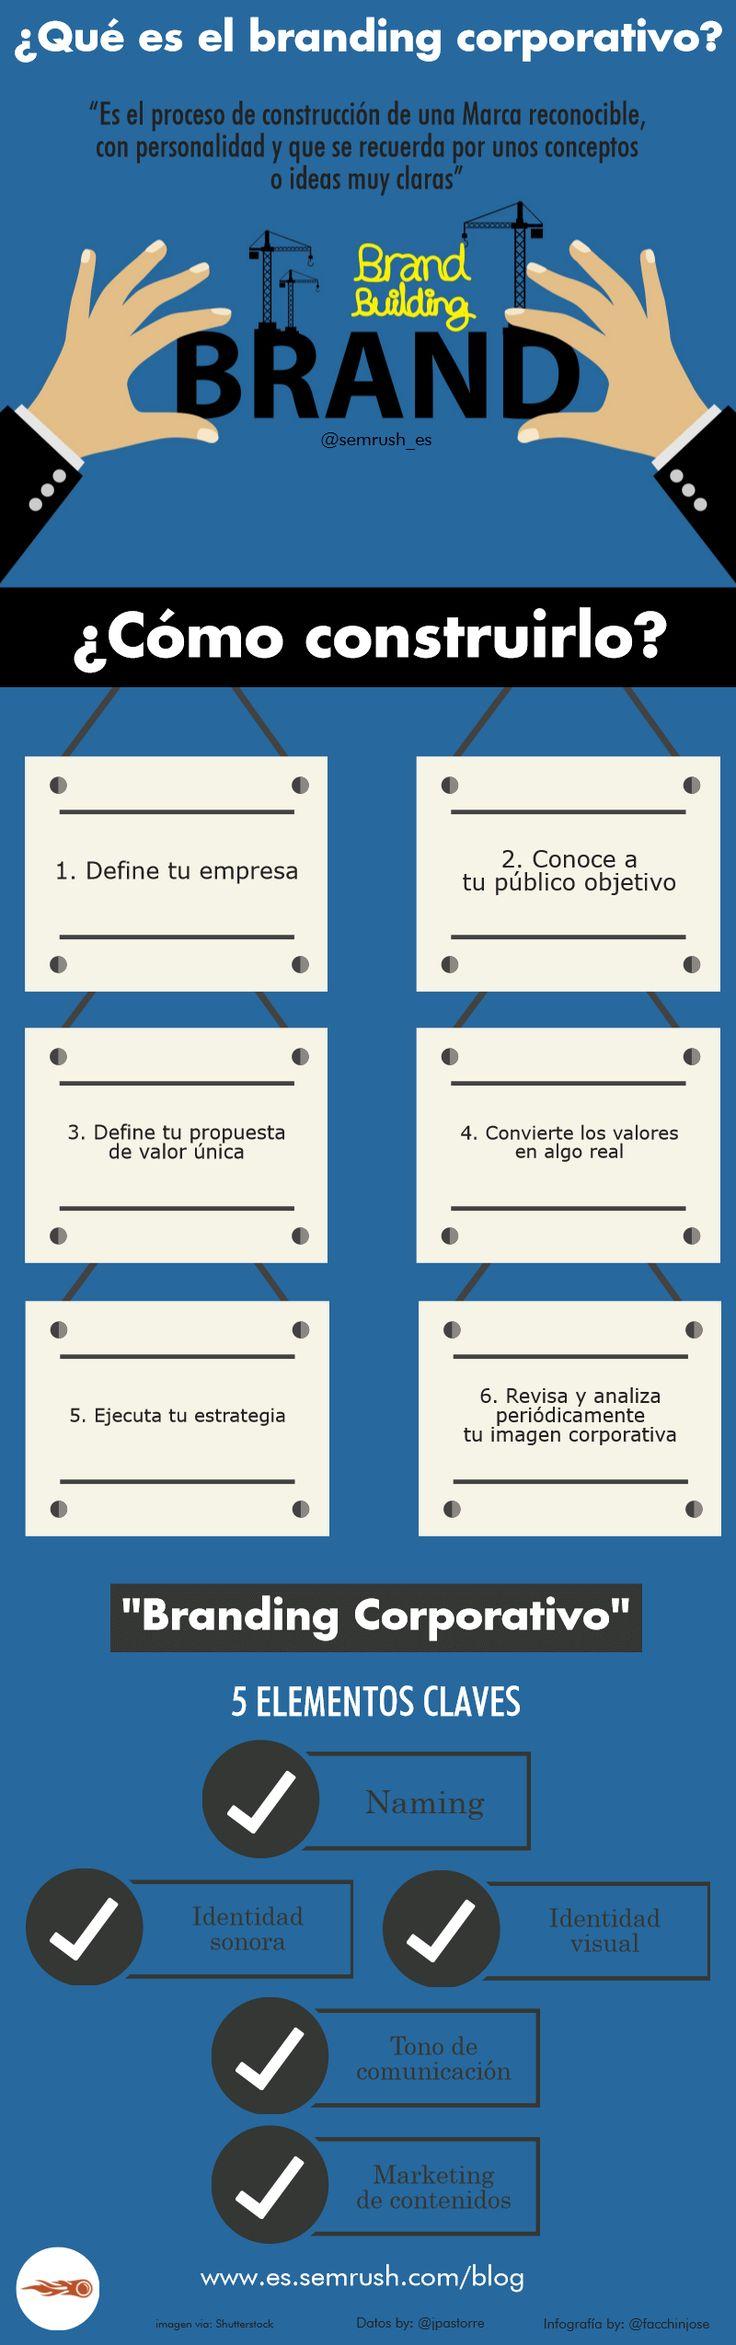 Branding Corporativo #infografia